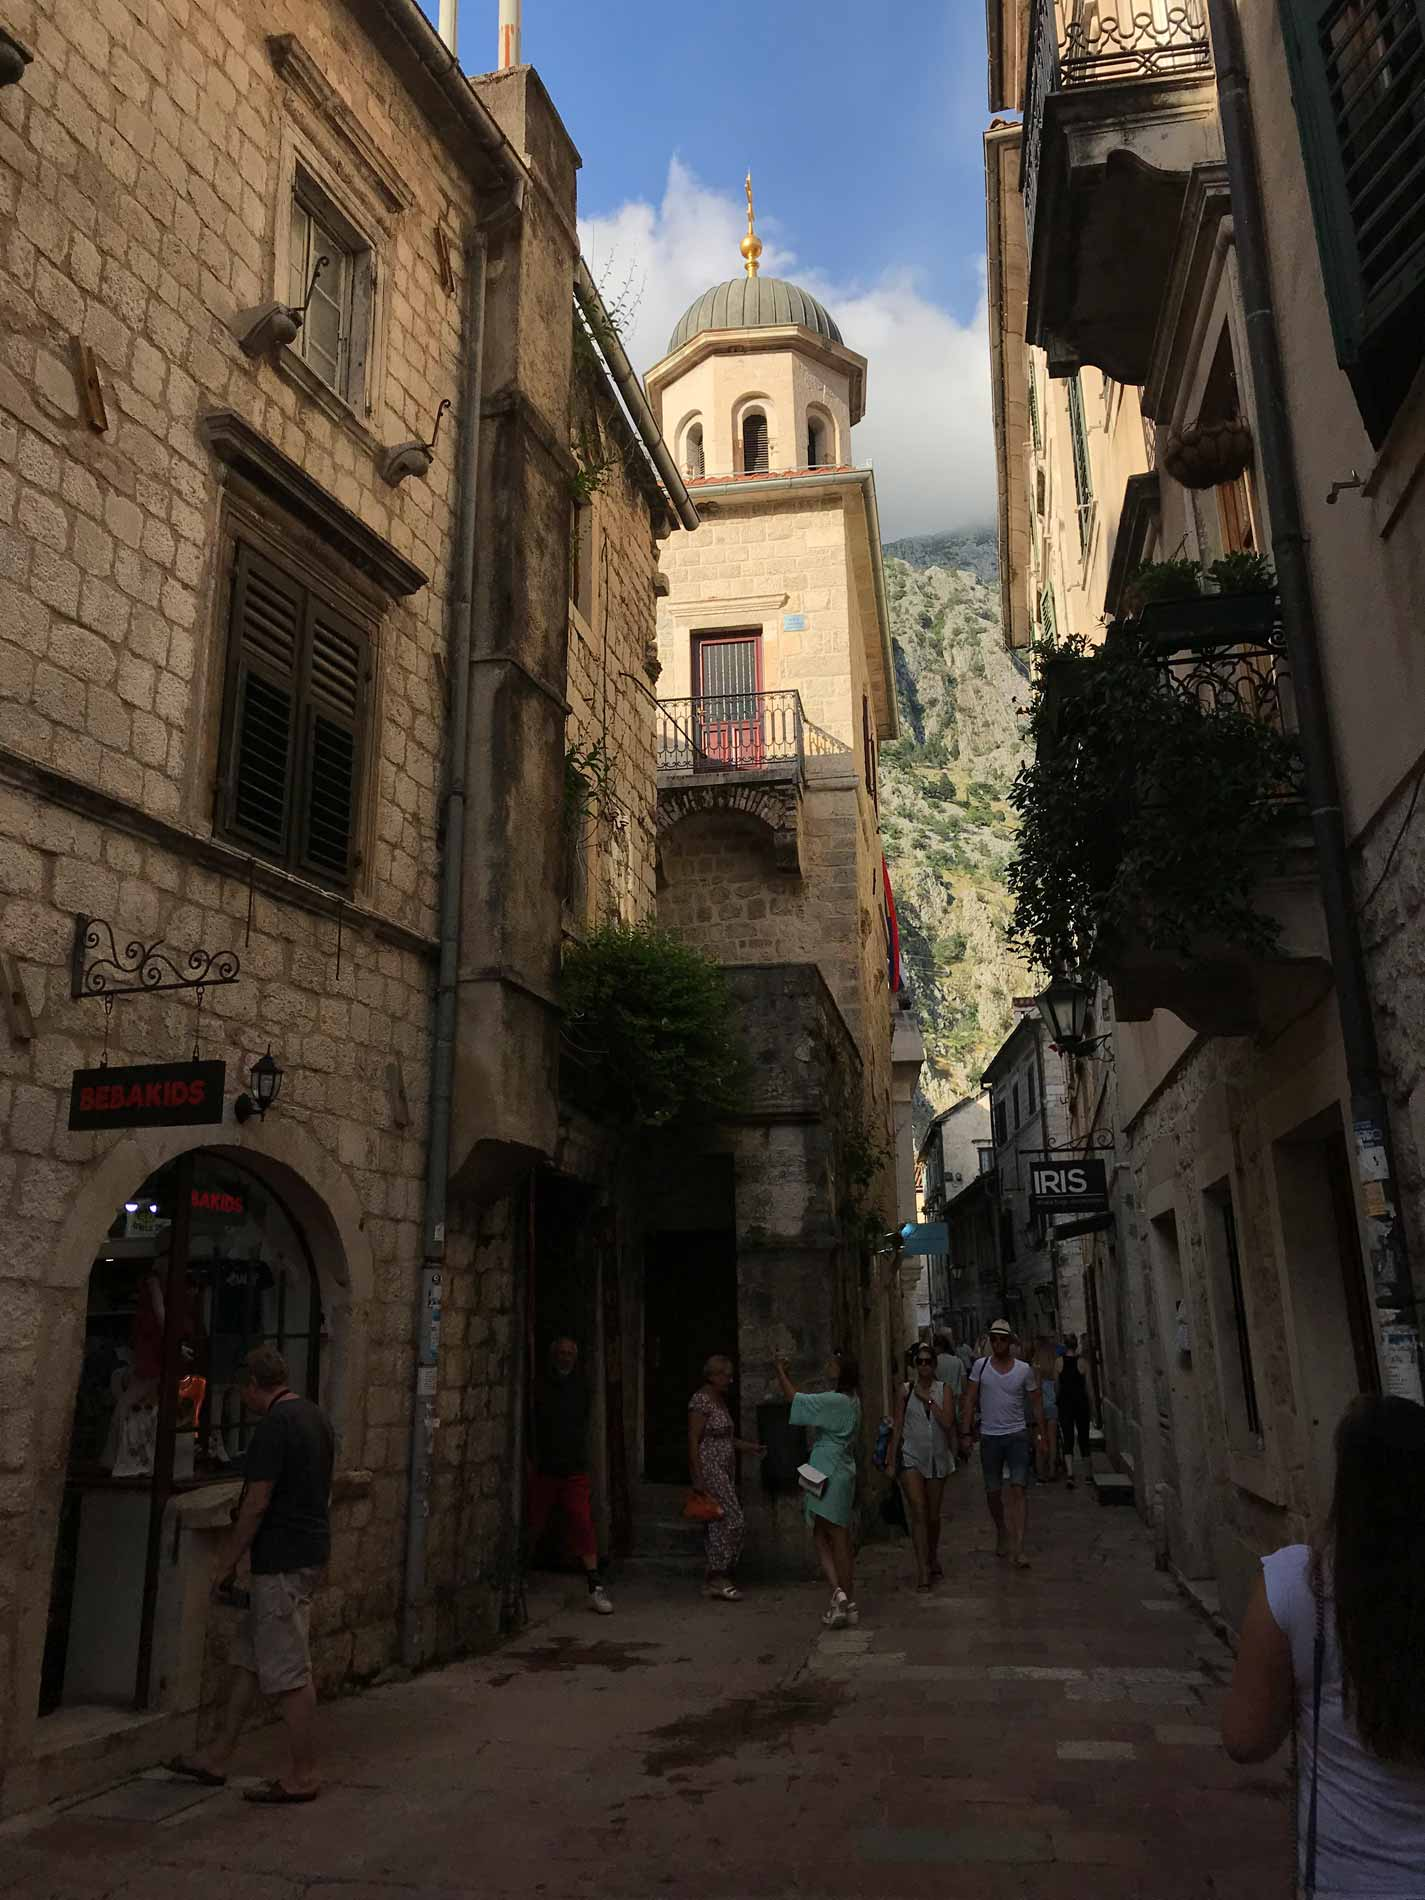 Kotor-Montenegro-Ulica1-scorcio-palazzi-negozi-pietra-a-vista